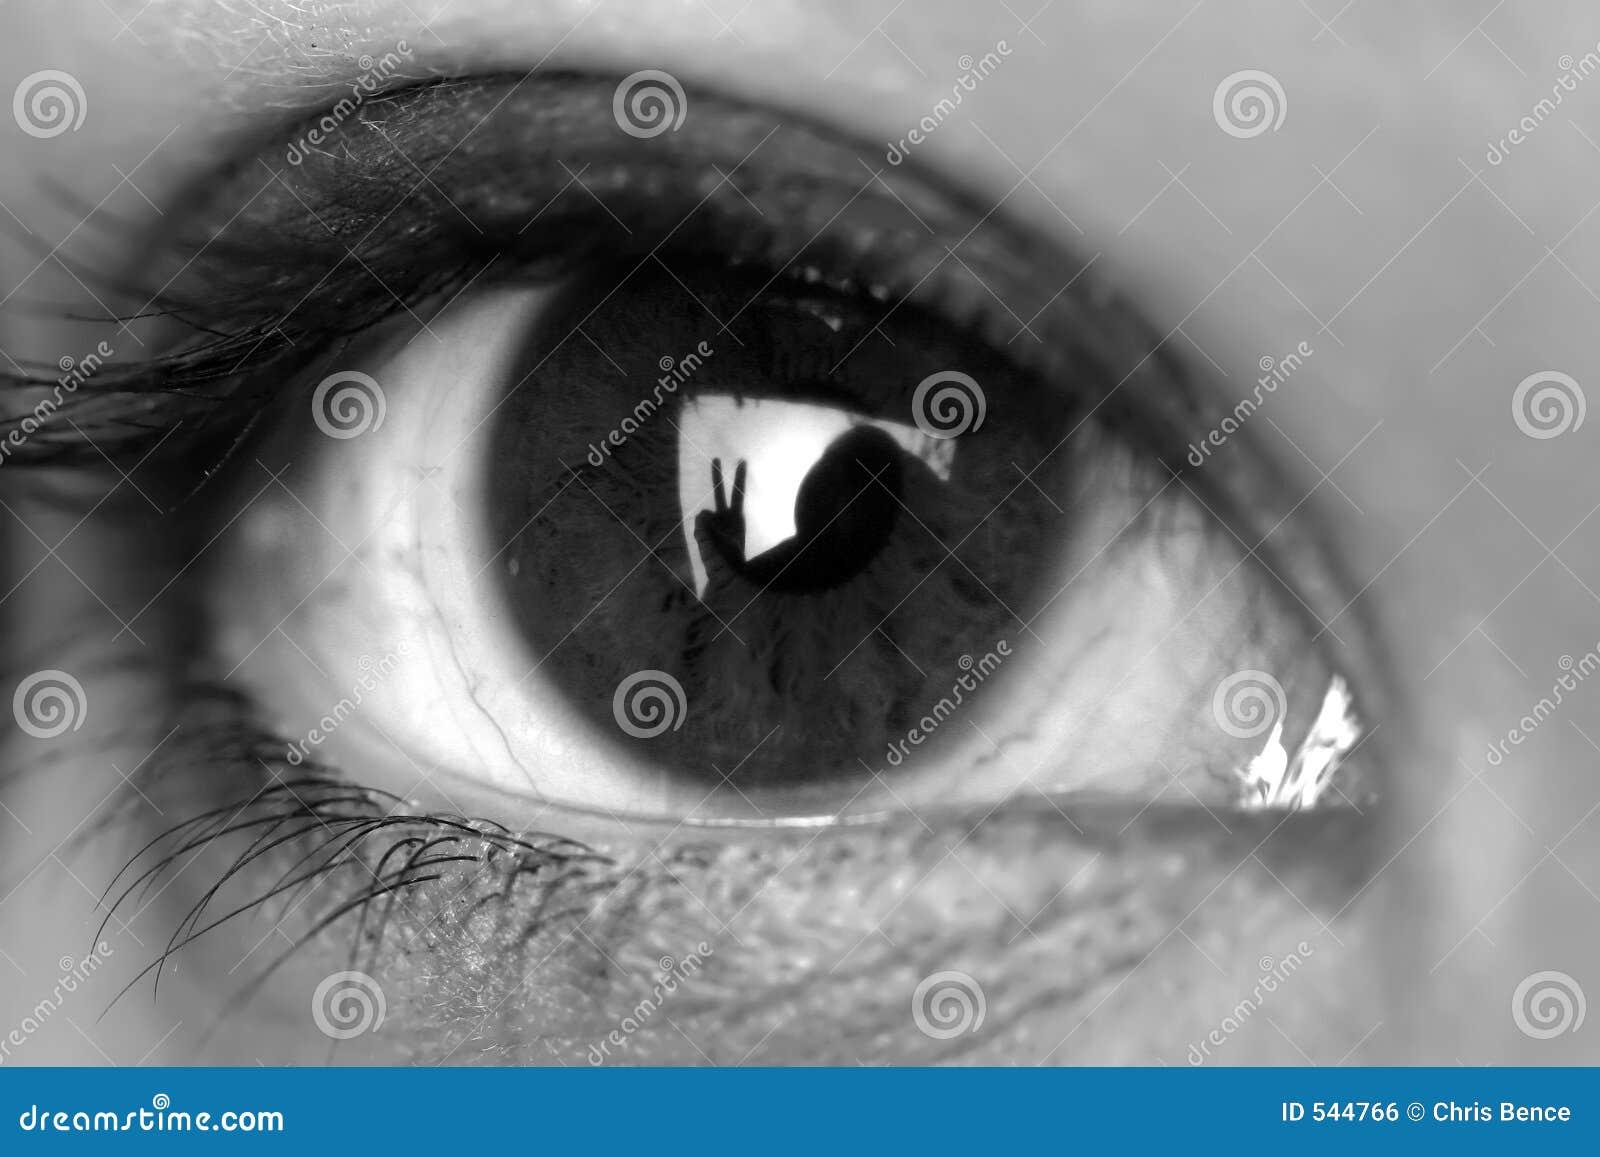 Download 和平 库存照片. 图片 包括有 眼睛, 投反对票, 竹子, 妇女, 空白, 和平, 鞭子, 关闭, 详细资料 - 544766